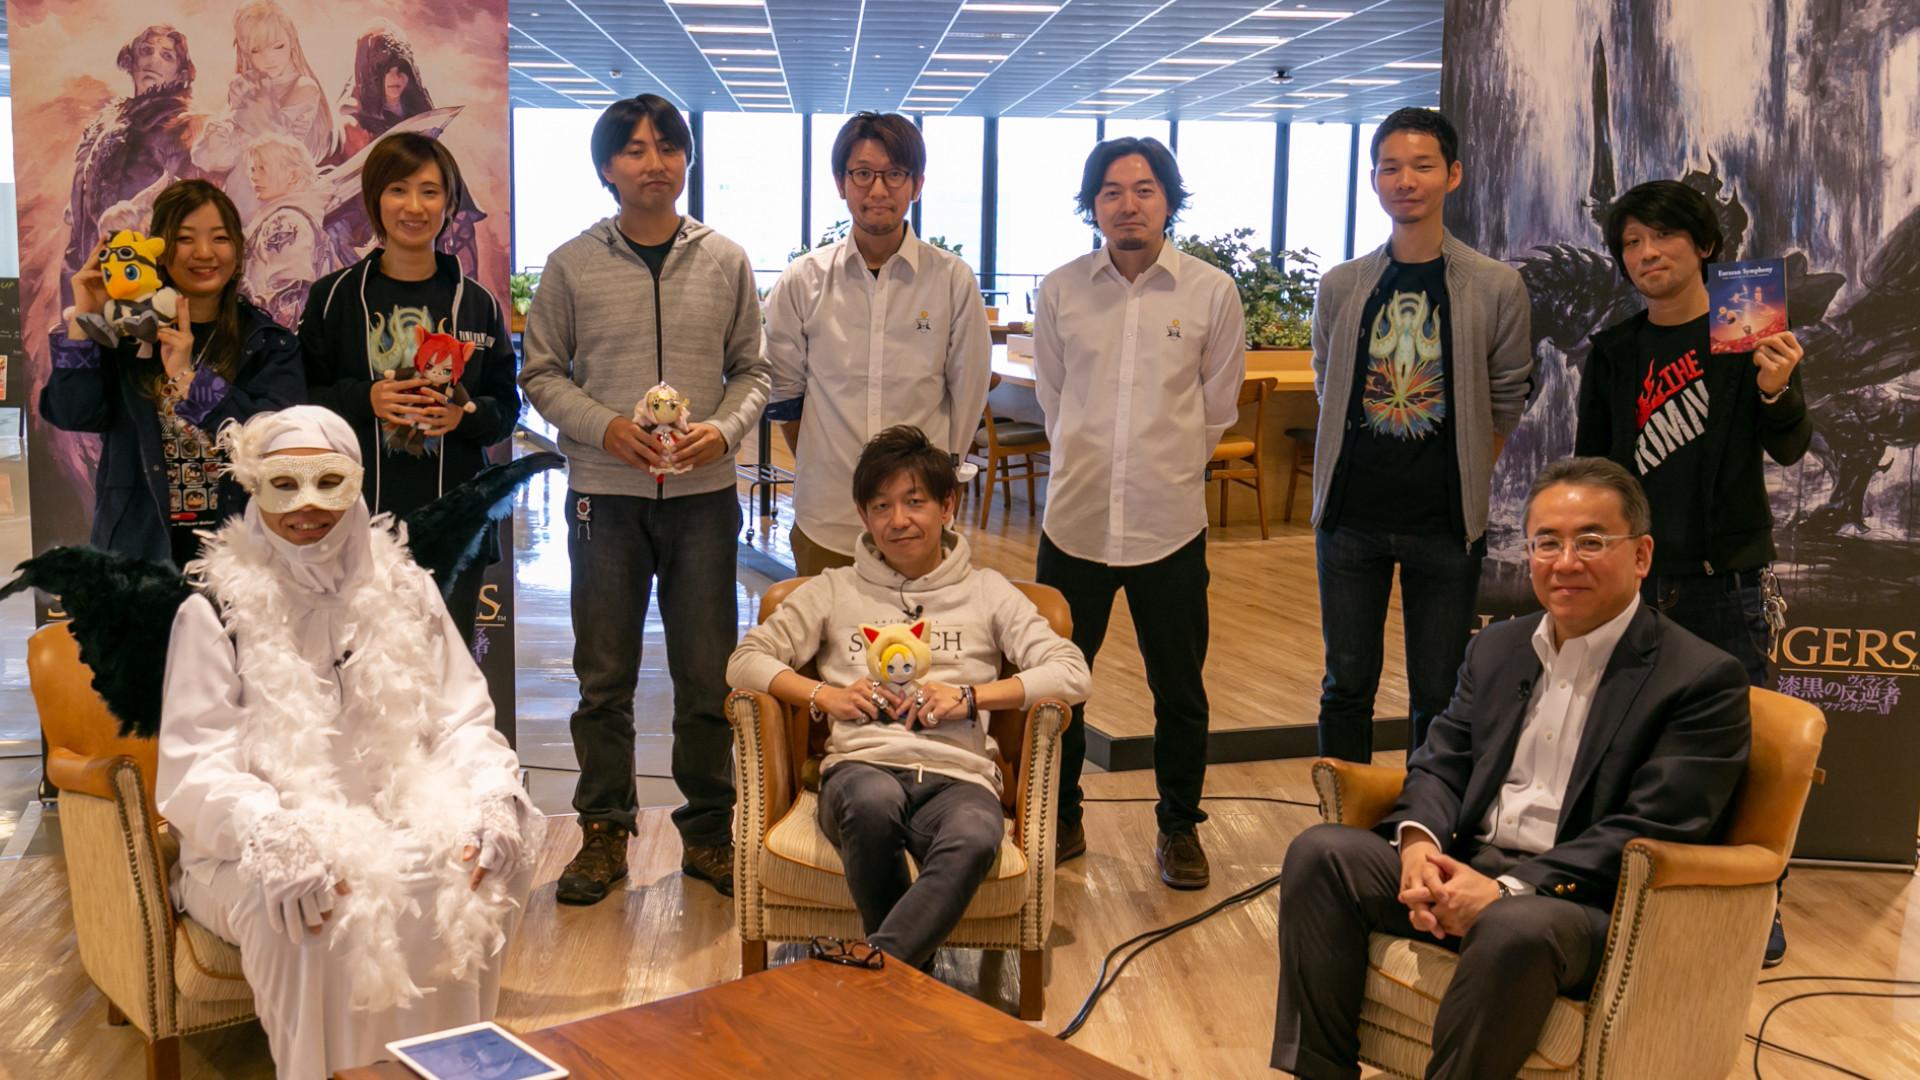 Final Fantasy XIV's seventh 14-hour broadcast arrives next week